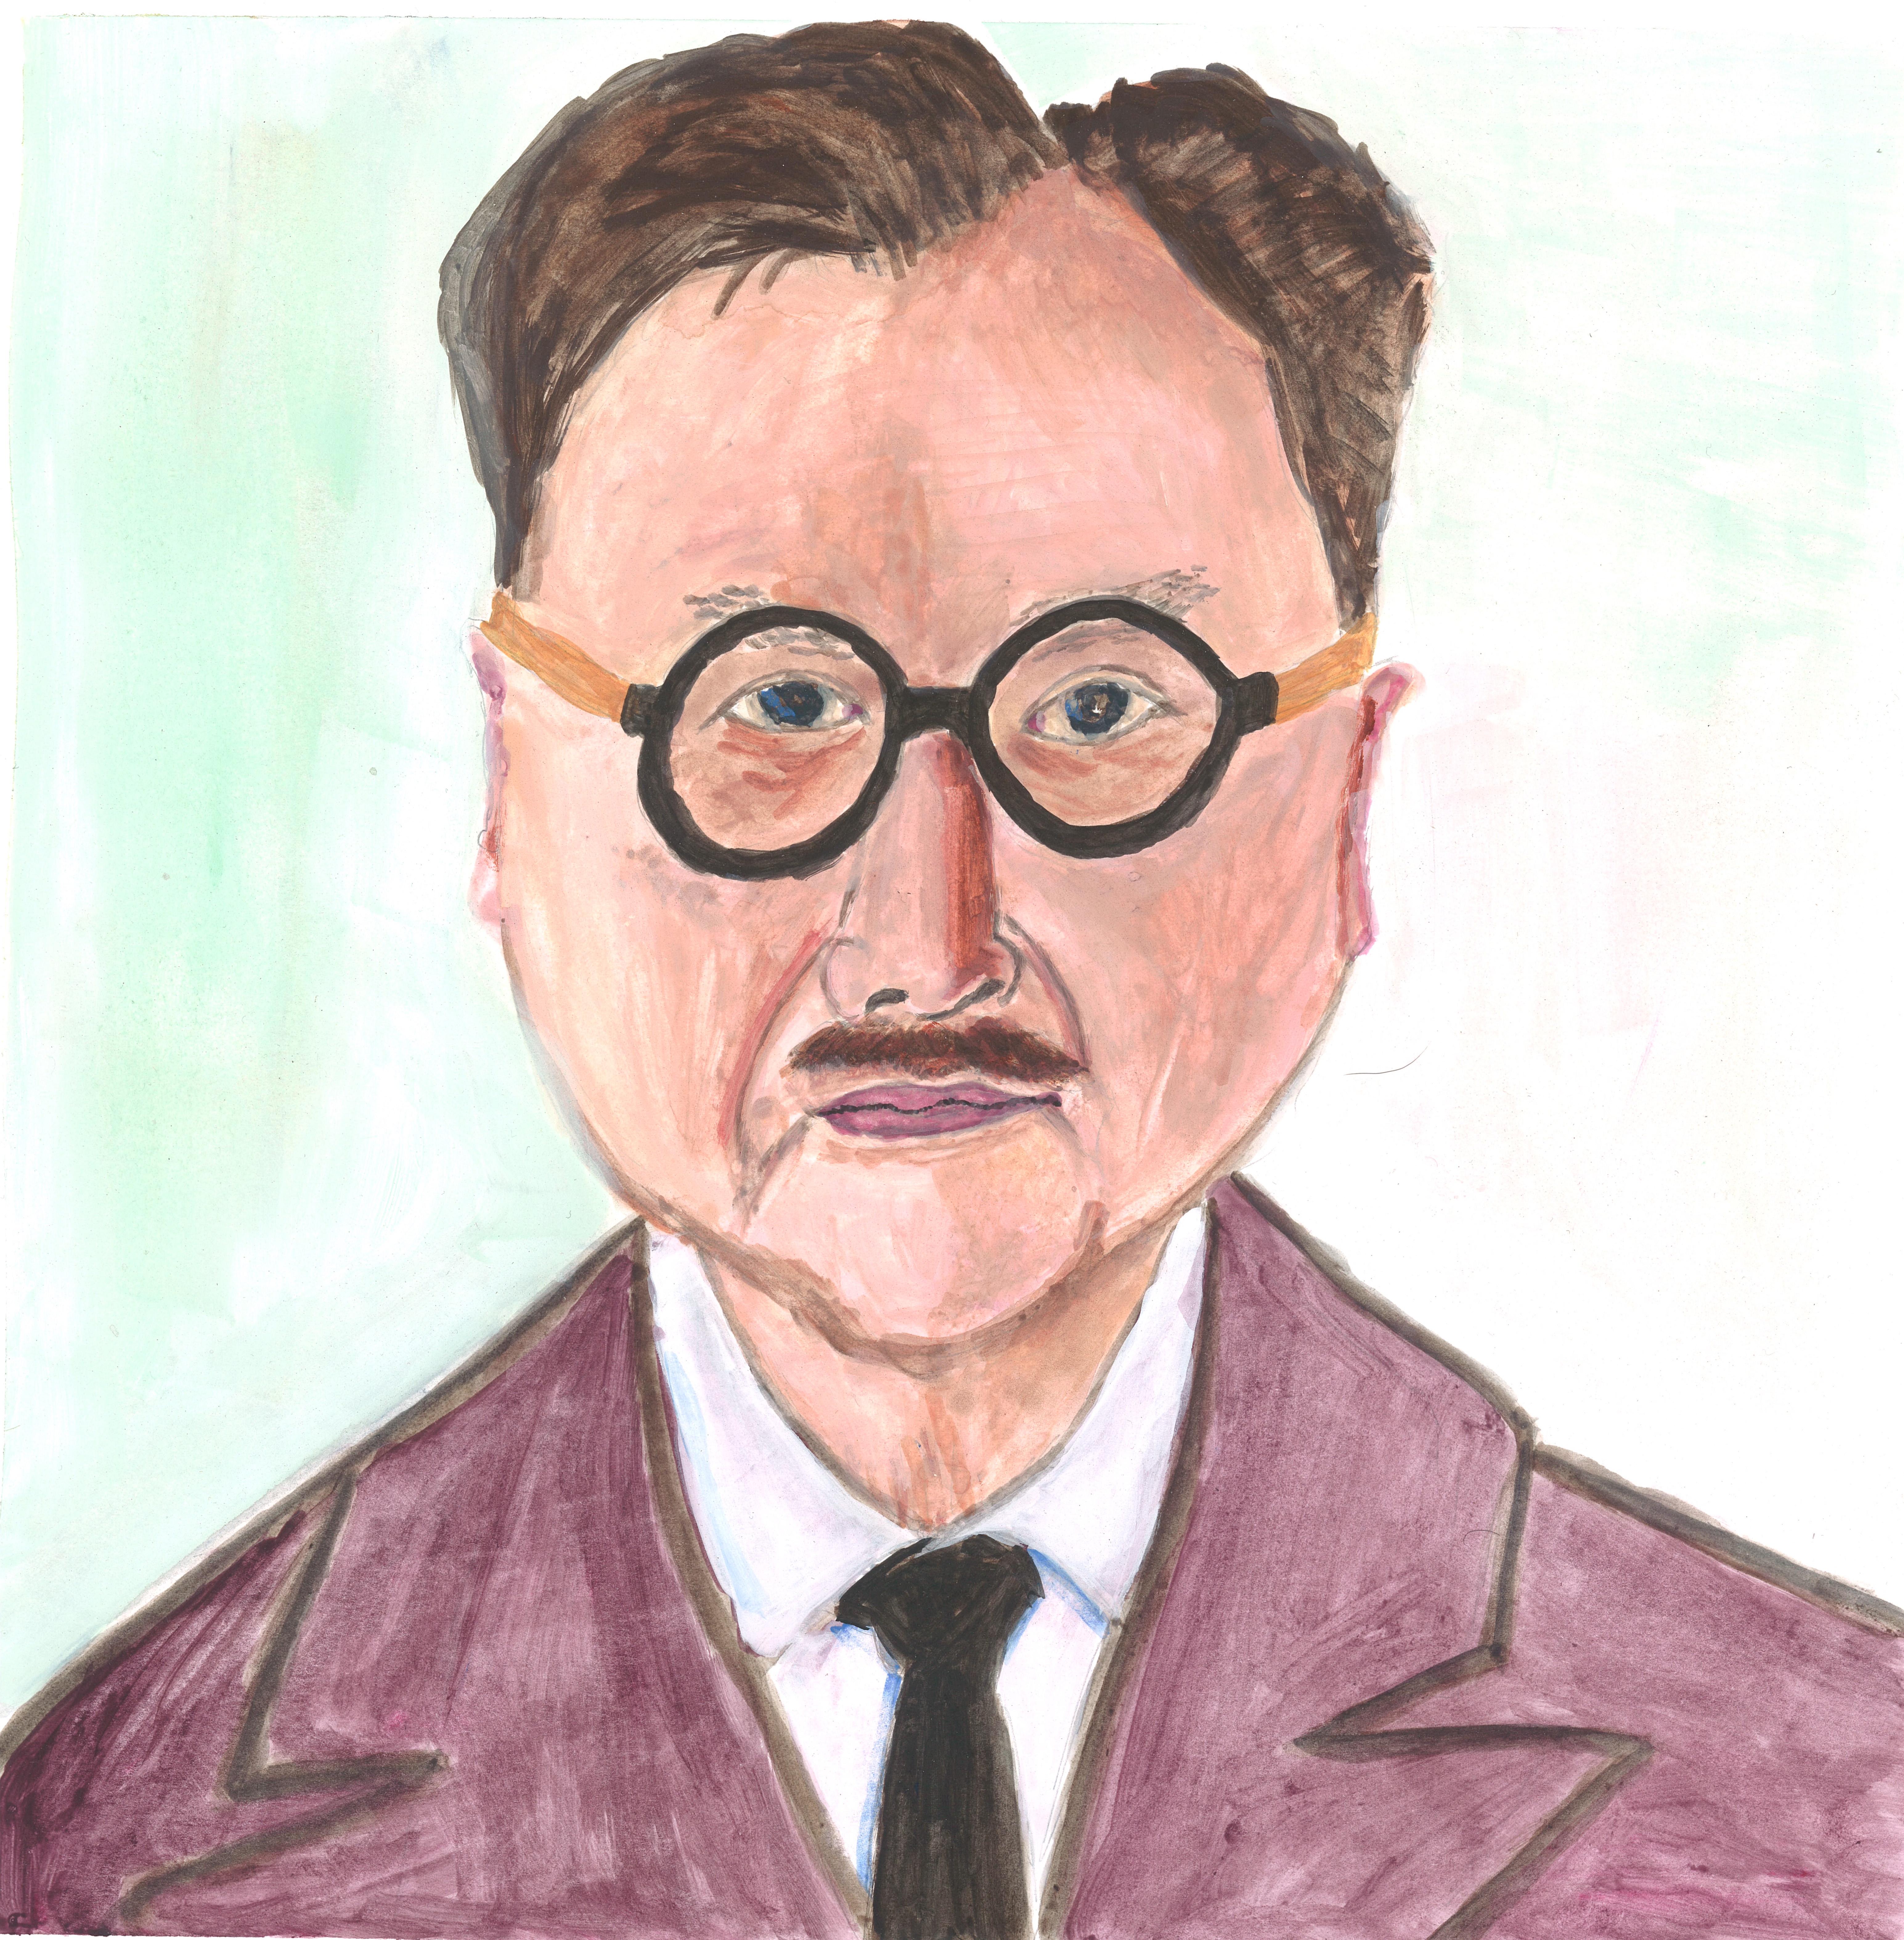 Portrait of Mr. Chow